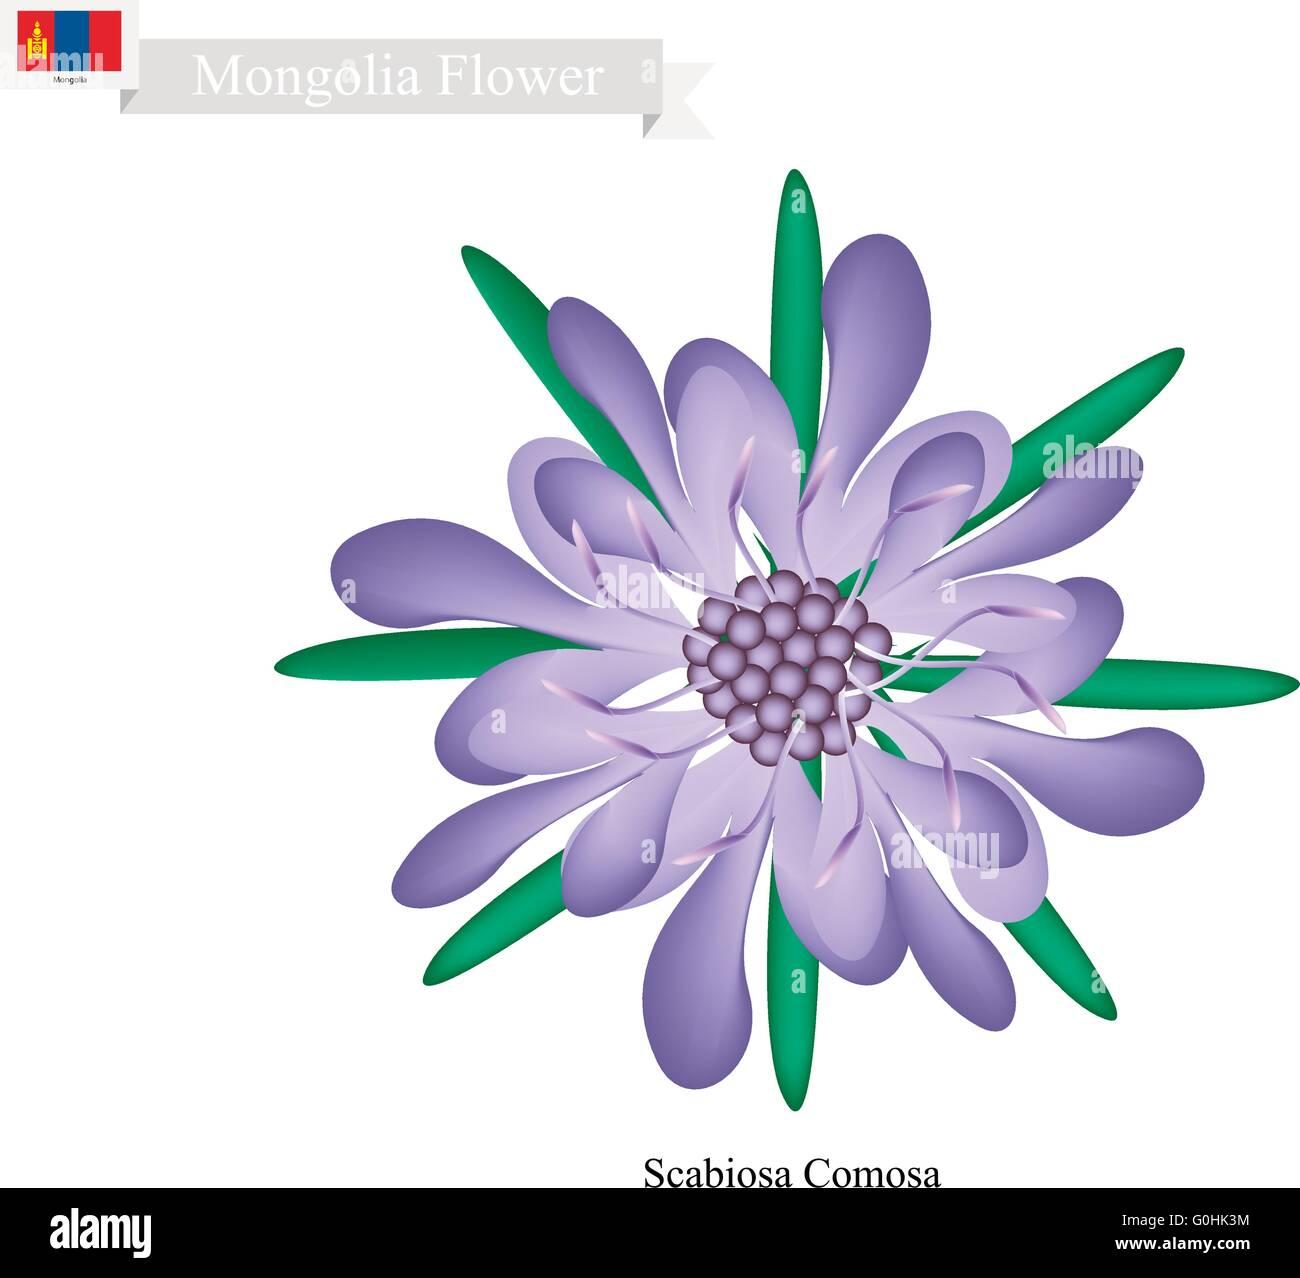 Mongolia Flower, Illustration of Scabiosa Comosa Flower. The National Flower in Mongolia. - Stock Vector